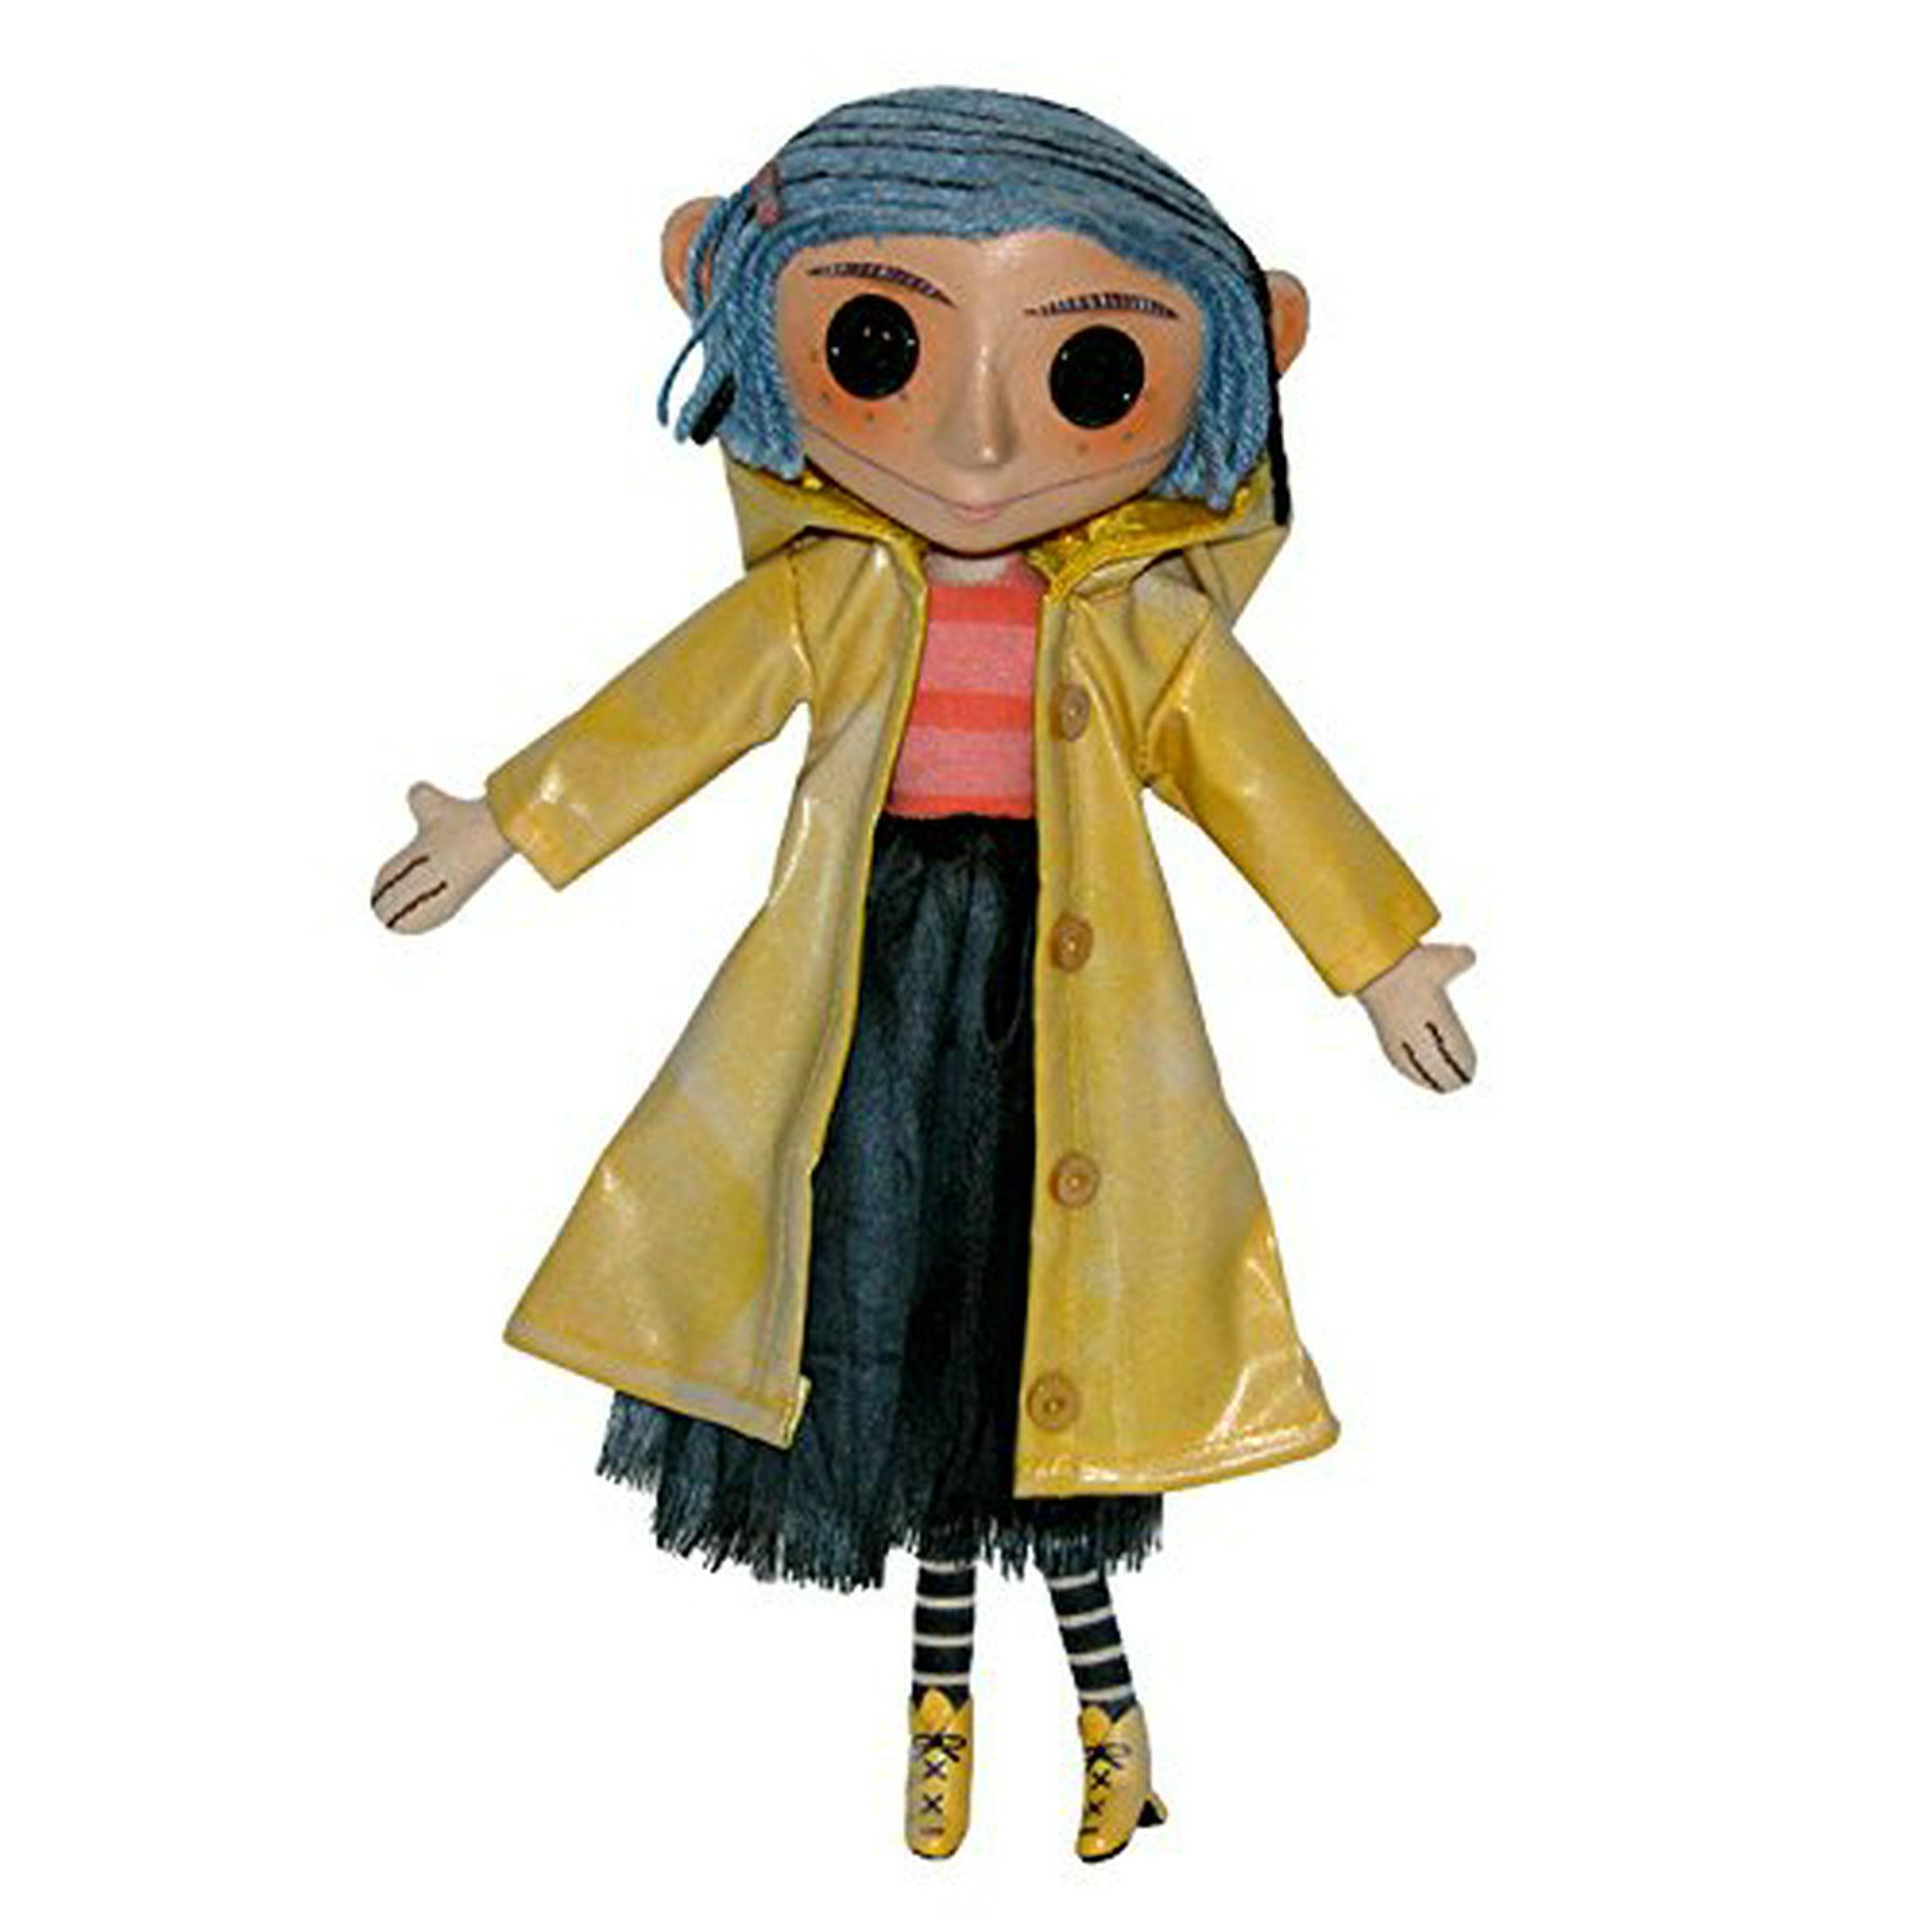 Neca Coraline Prop Replica 10 Coraline Doll Walmart Canada